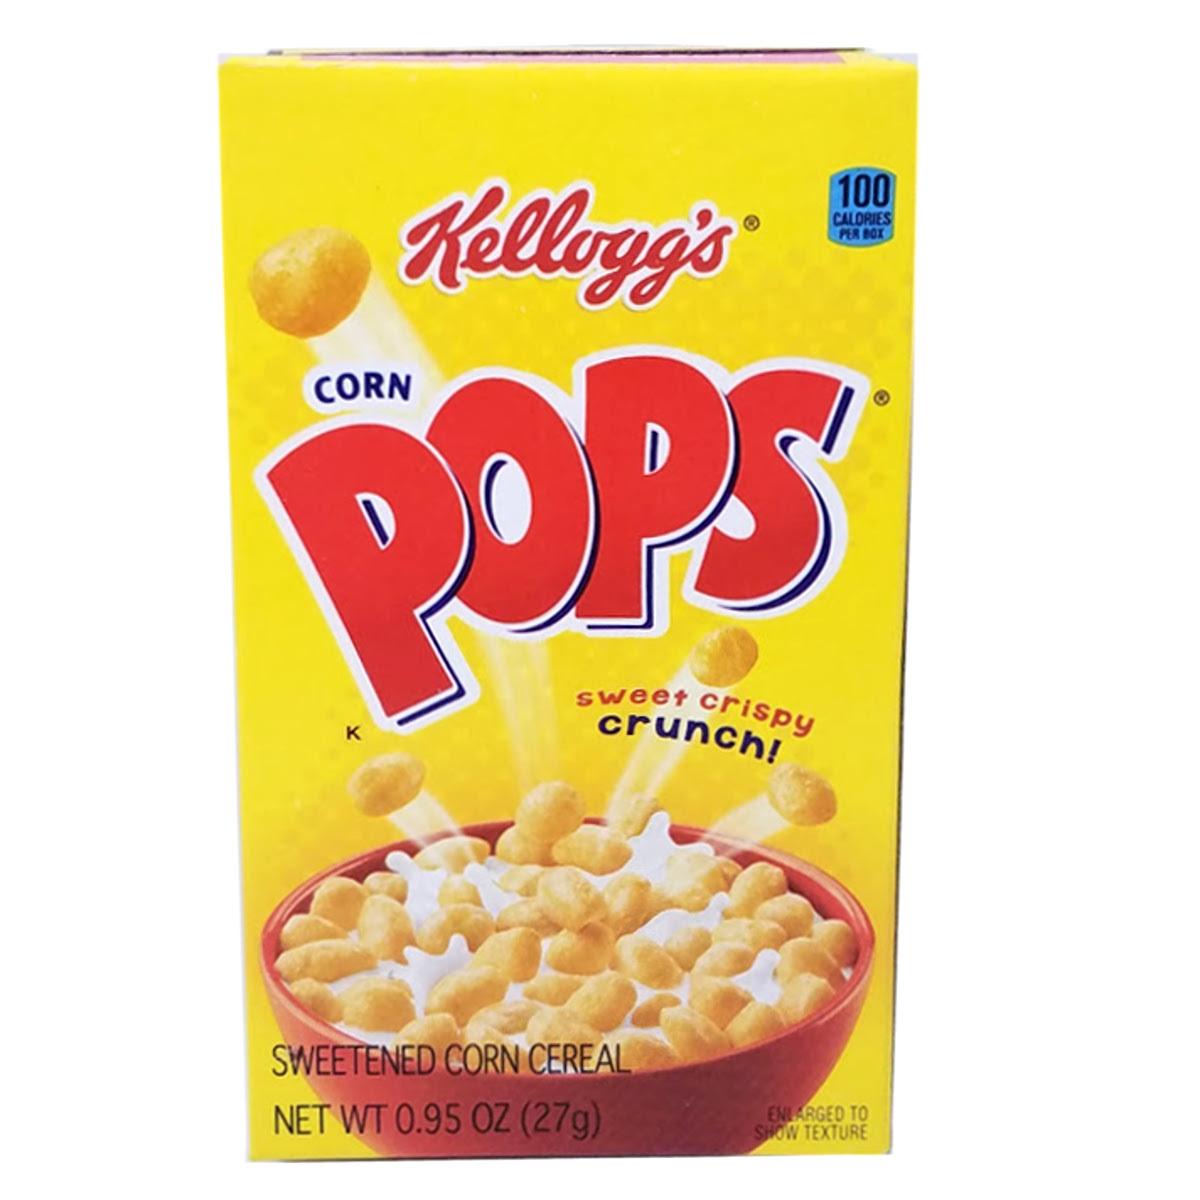 Wholesale Kelloggs Corn Pops Cereal (box) (SKU 362341